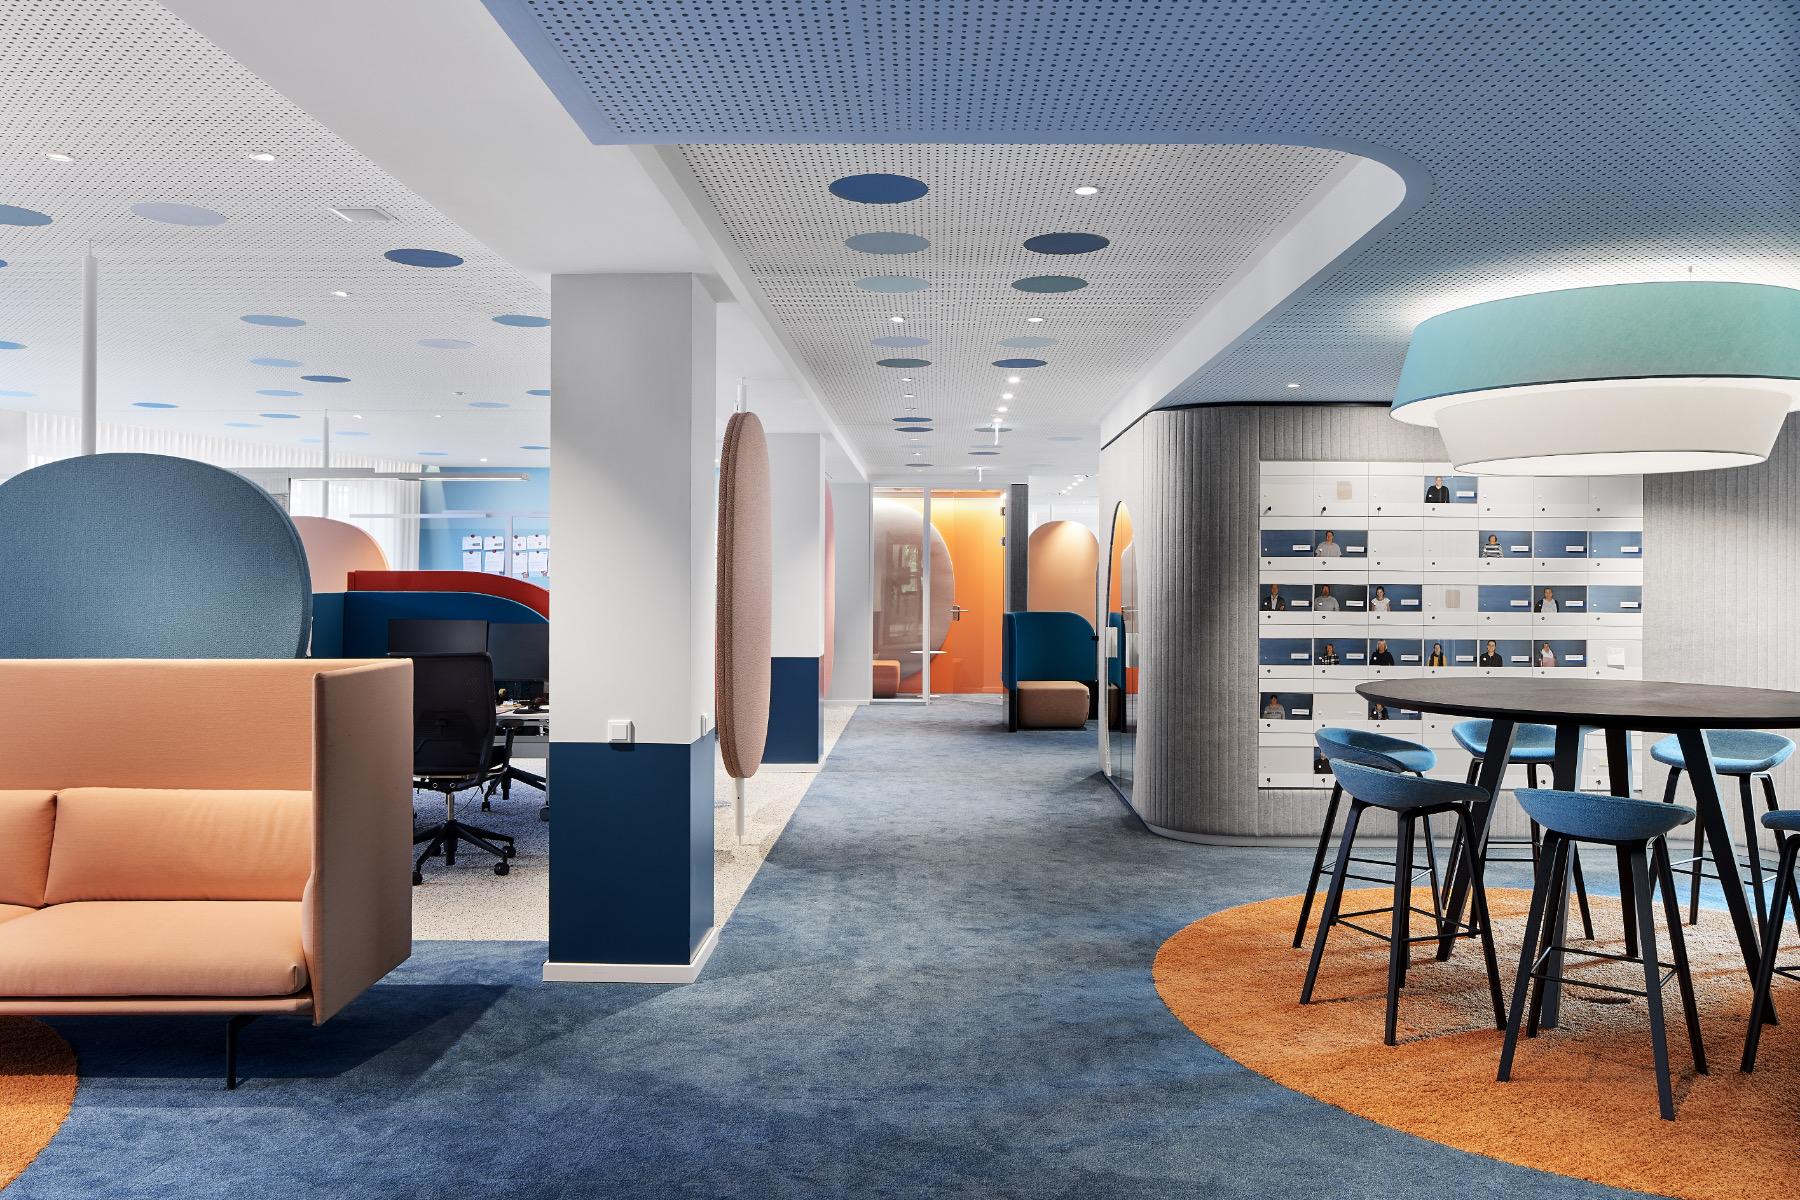 A Tour of Aktion Mensch's Cool New Bonn Office